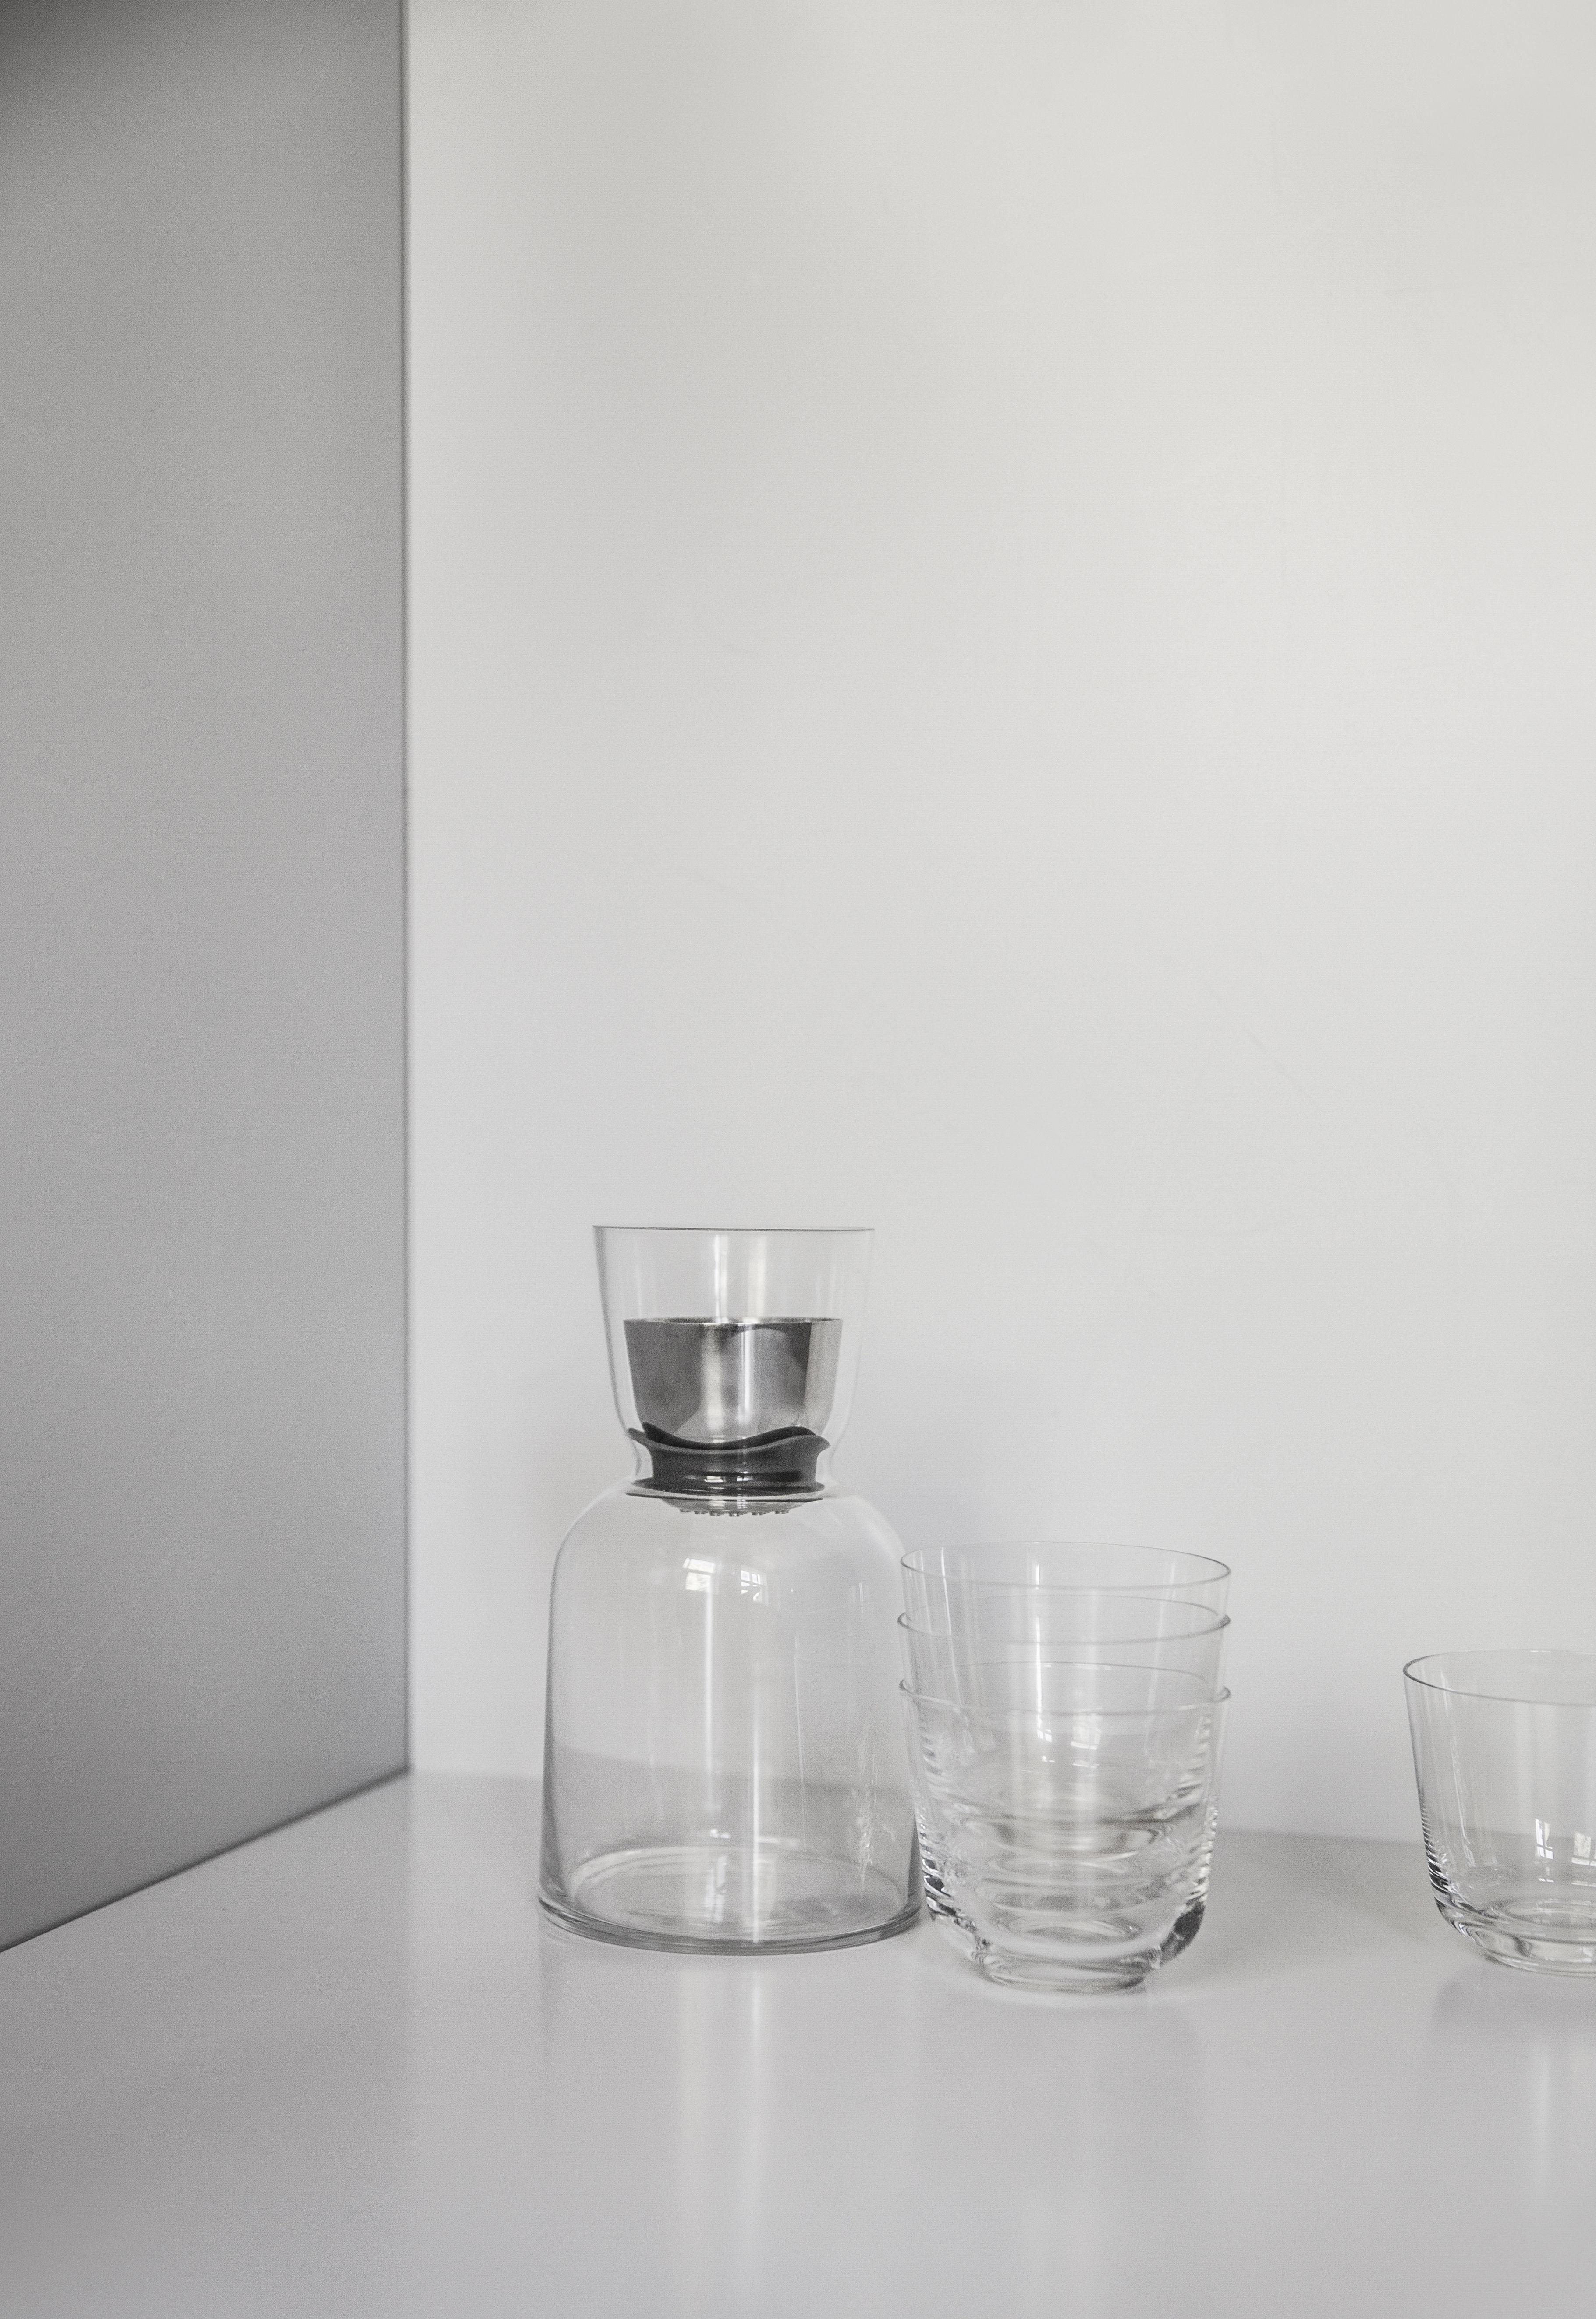 verre w w menu transparent h 10 x 11 made in design. Black Bedroom Furniture Sets. Home Design Ideas